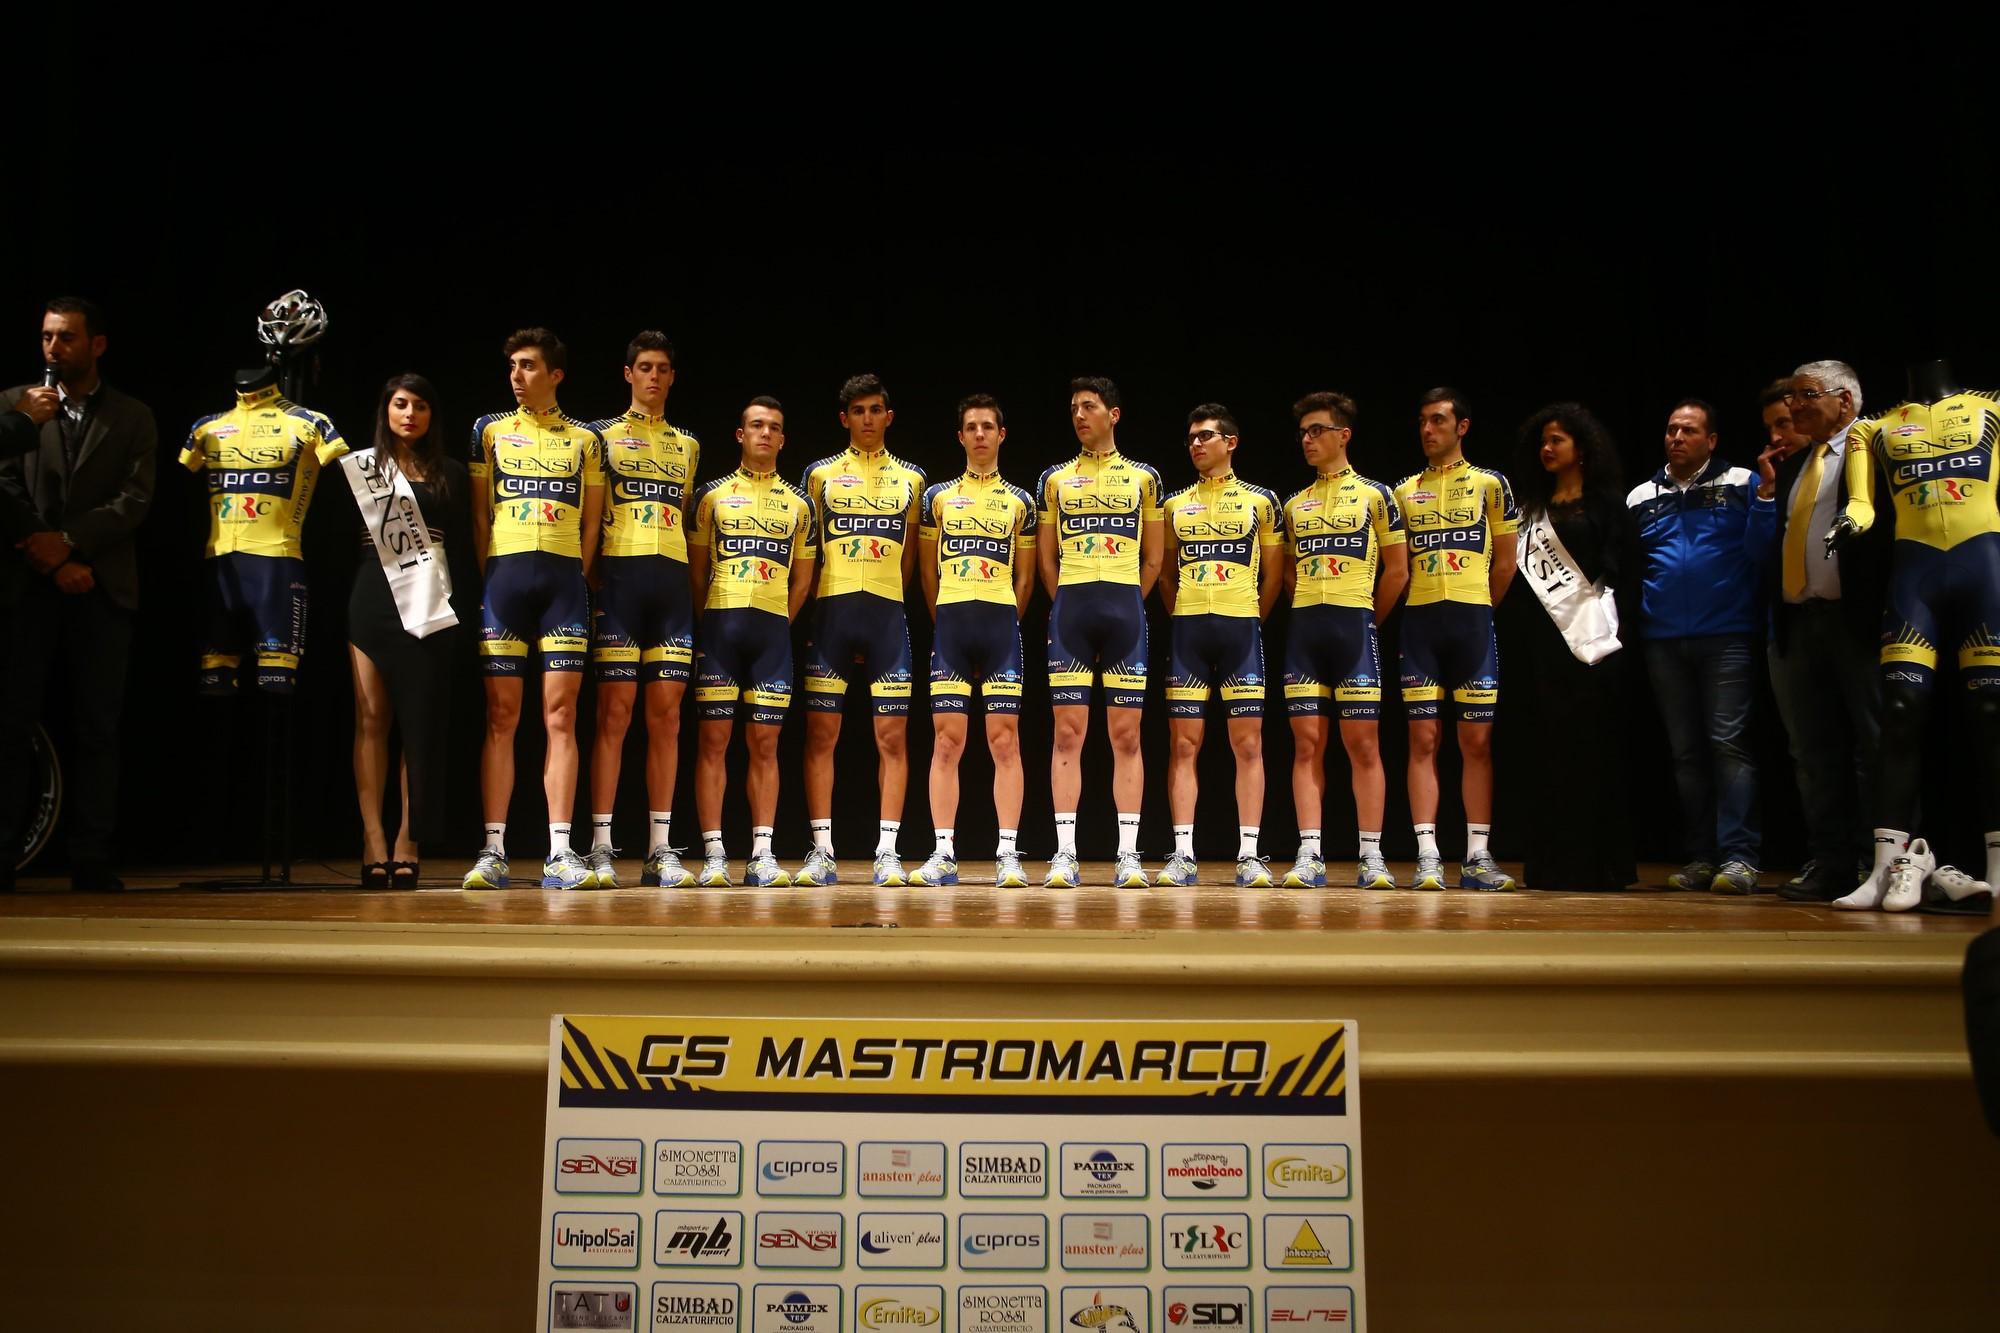 Foto Squadra Mastromarco